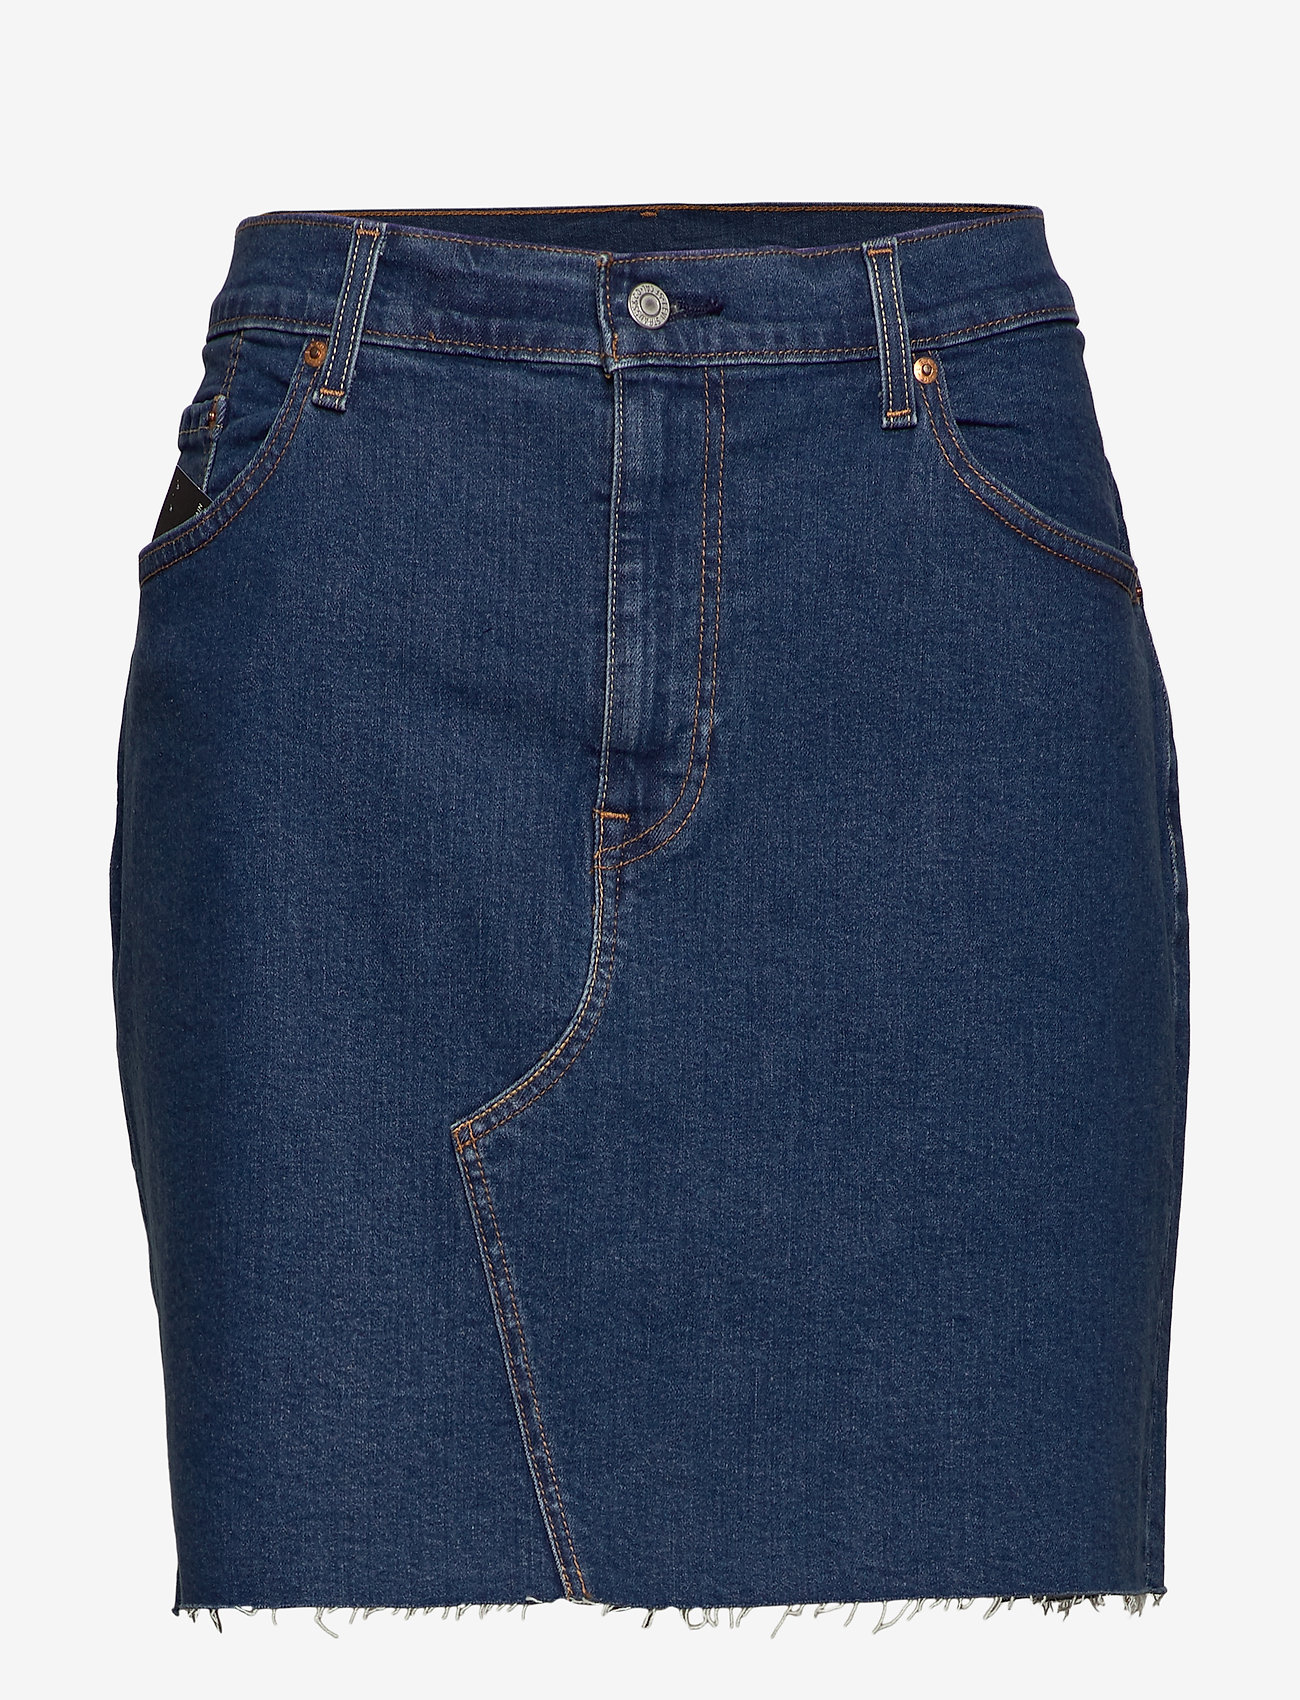 Levi's Plus Size - PL DECONSTRUCTED SKIRT MEET IN - jeansrokken - med indigo - flat finish - 0